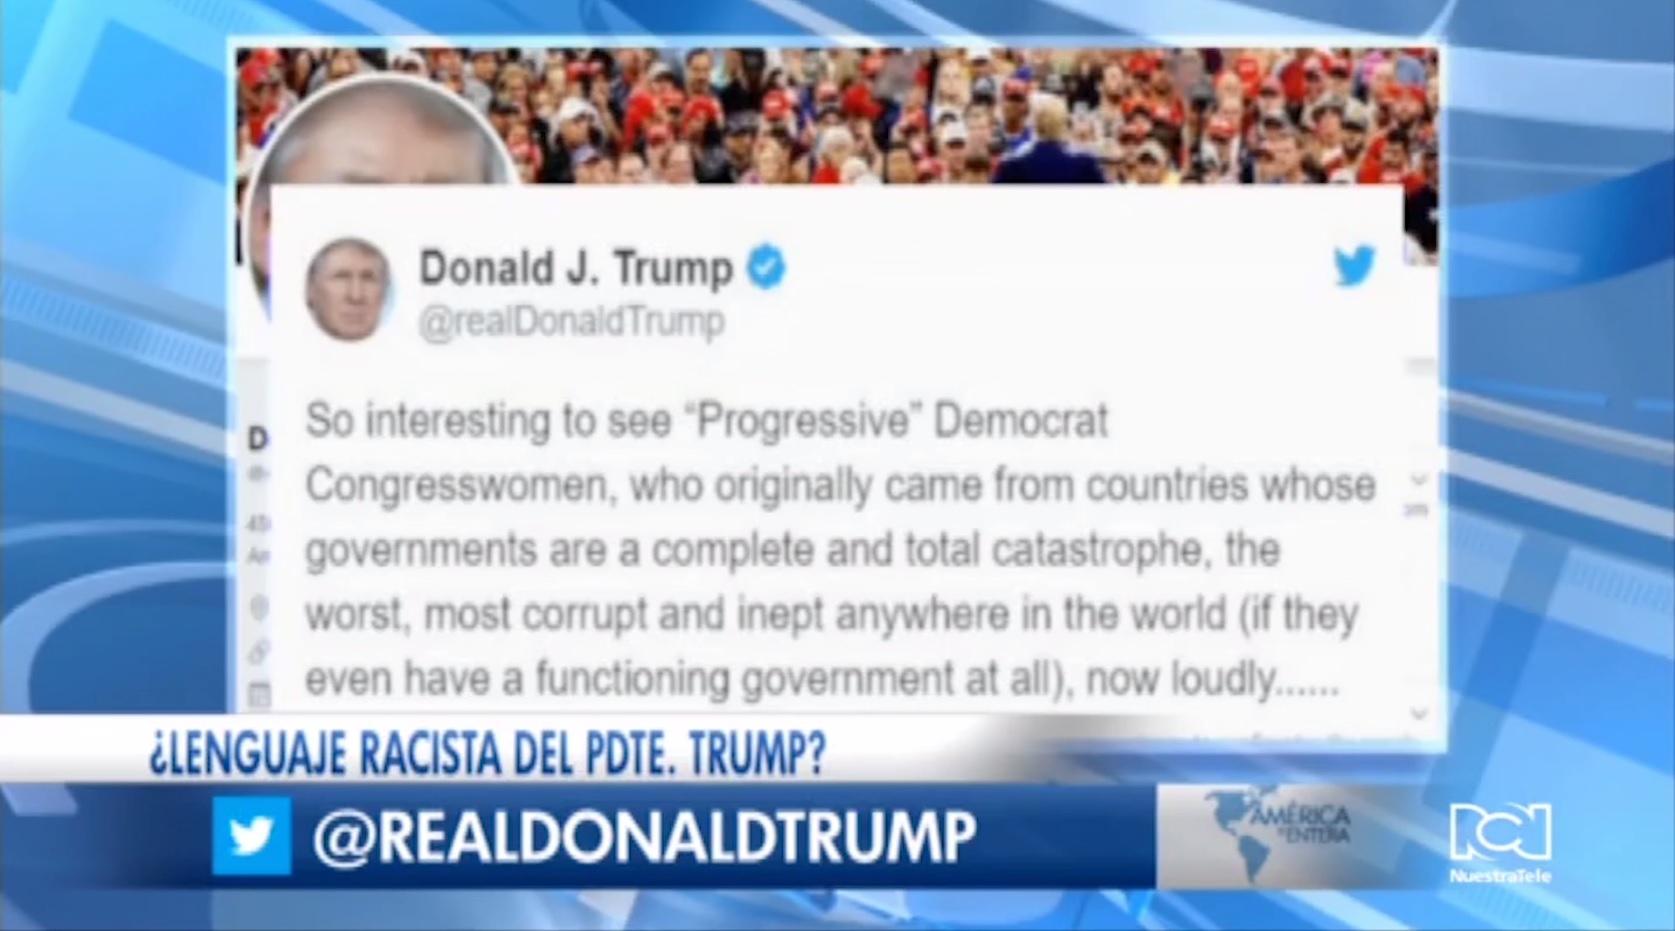 Trump usa lenguaje racista contra democratas